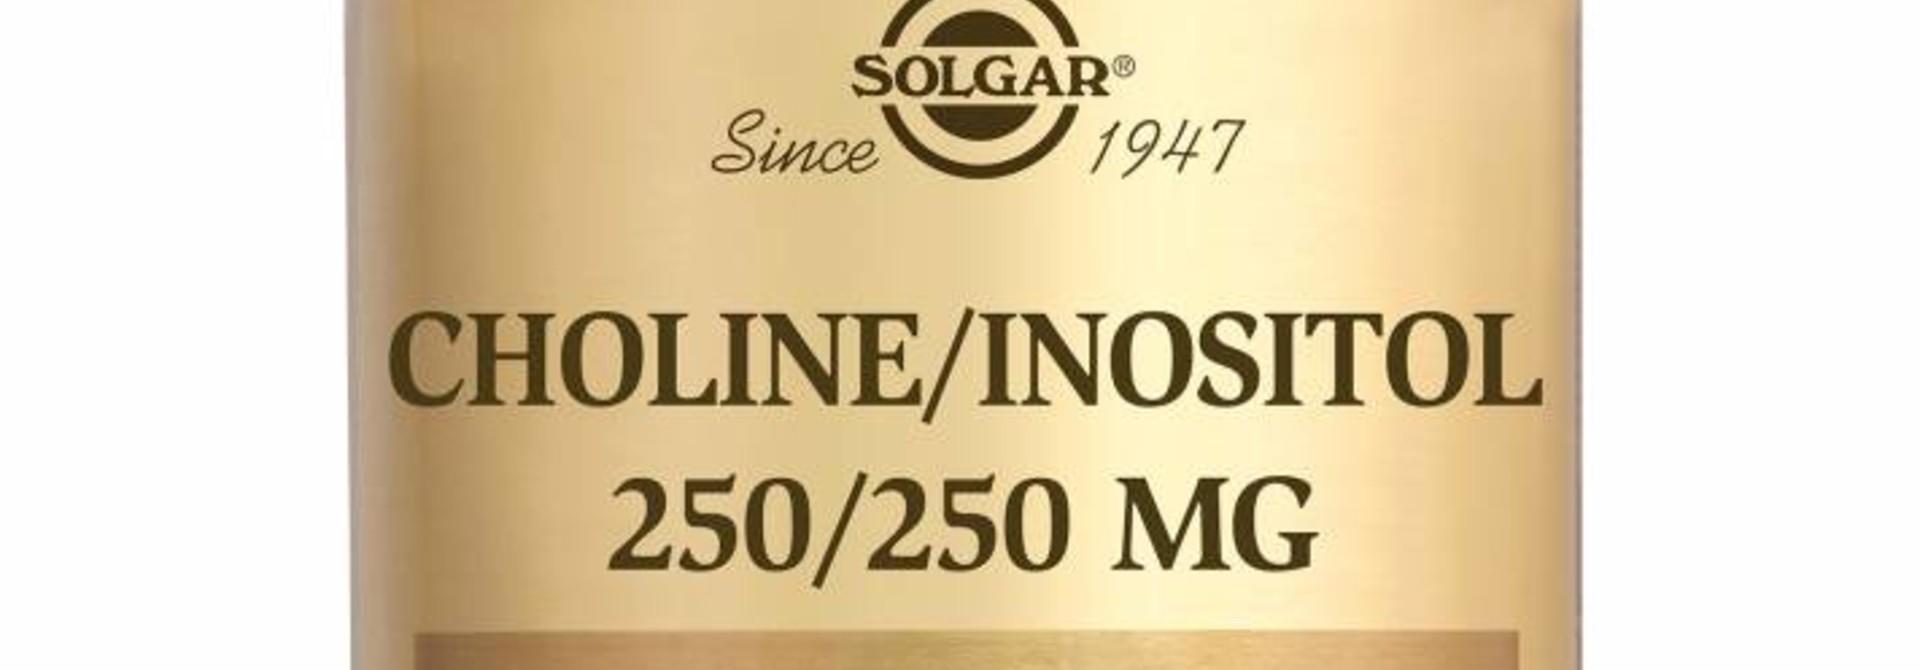 Choline/Inositol 250/250 50 plantaardige capsules